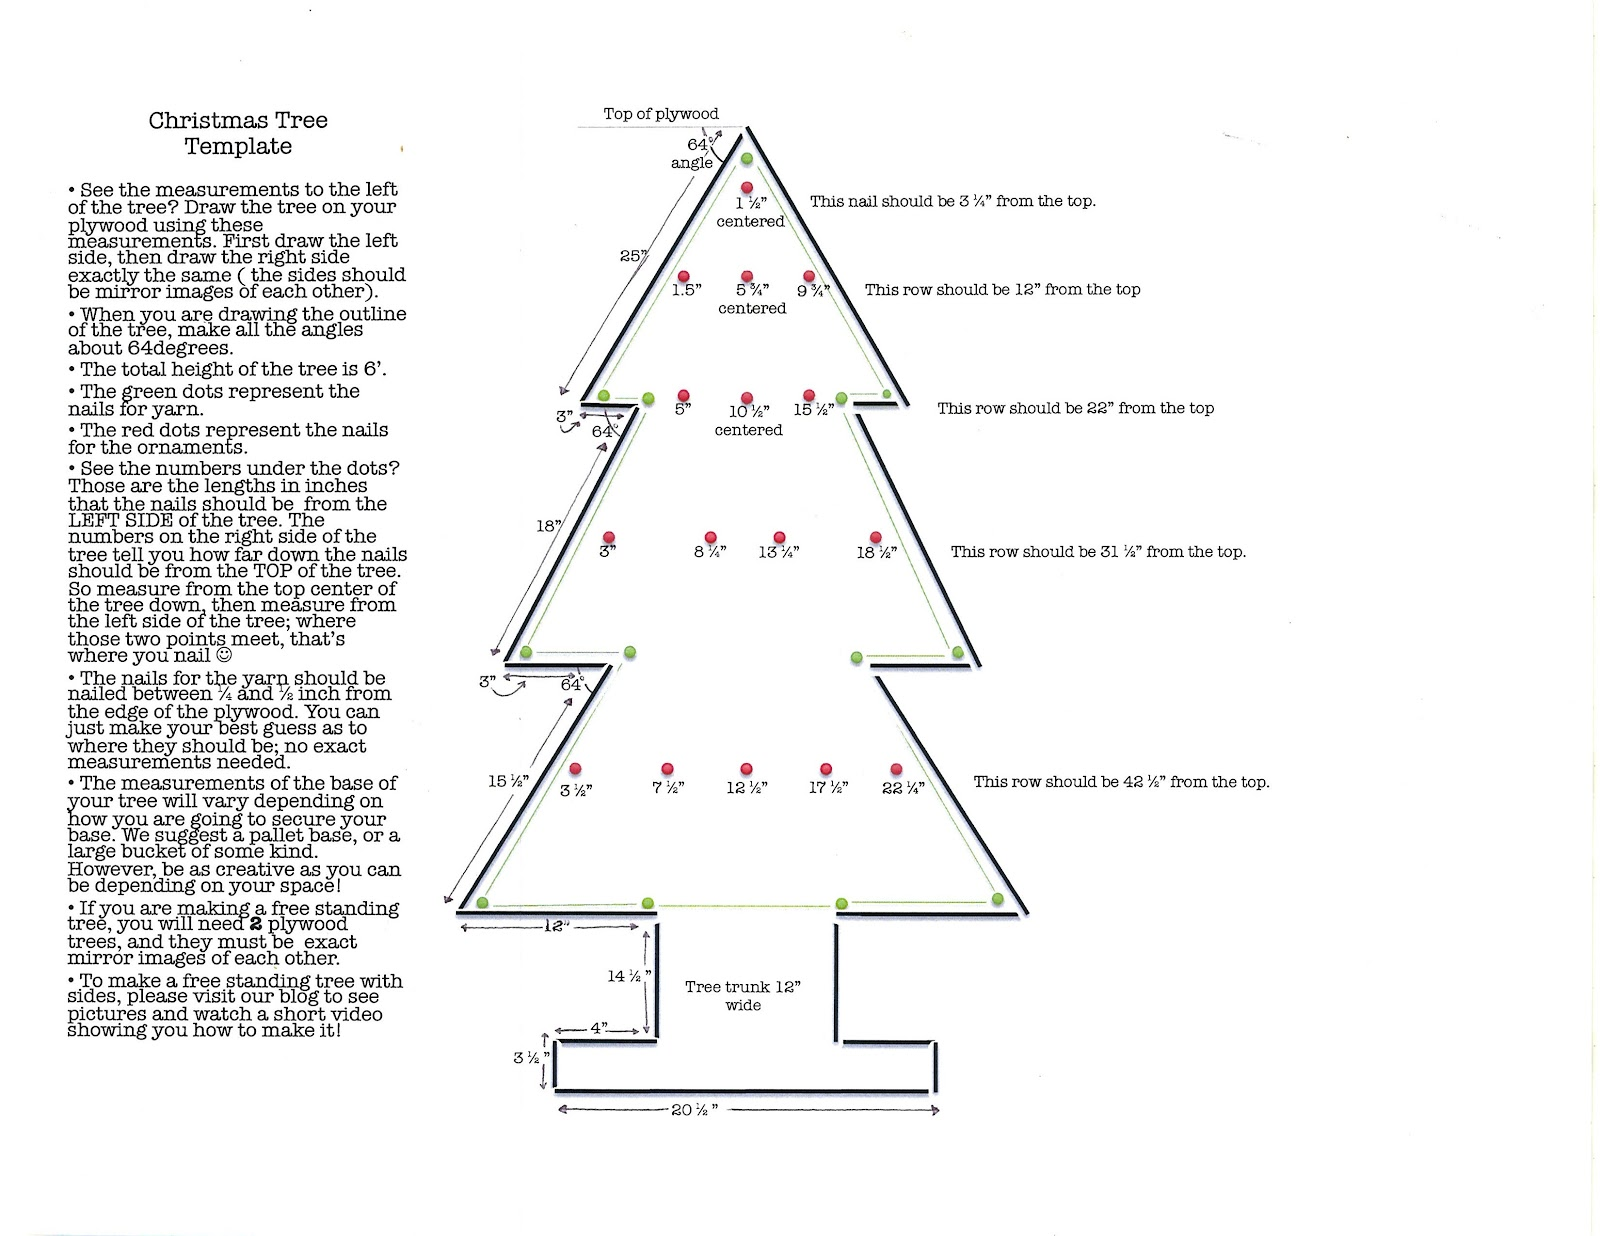 Glory haus blog plywood christmas tree how to for Plywood christmas tree